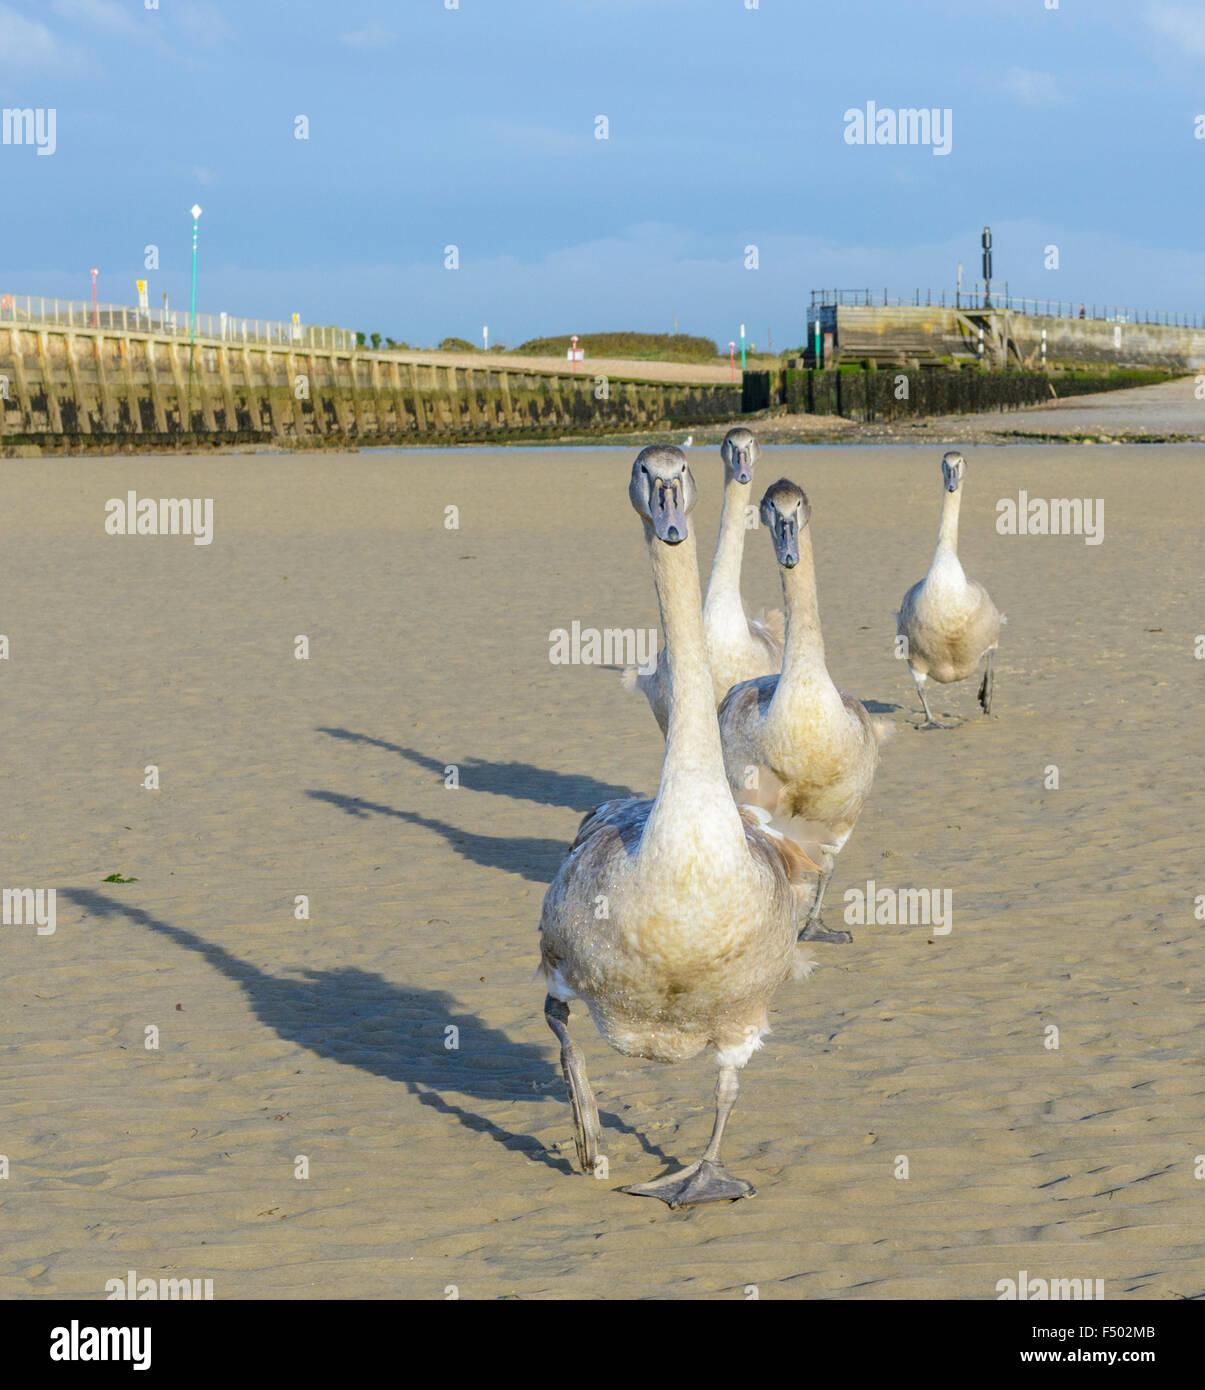 cygnets-walking-across-a-sandy-beach-F502MB.jpg